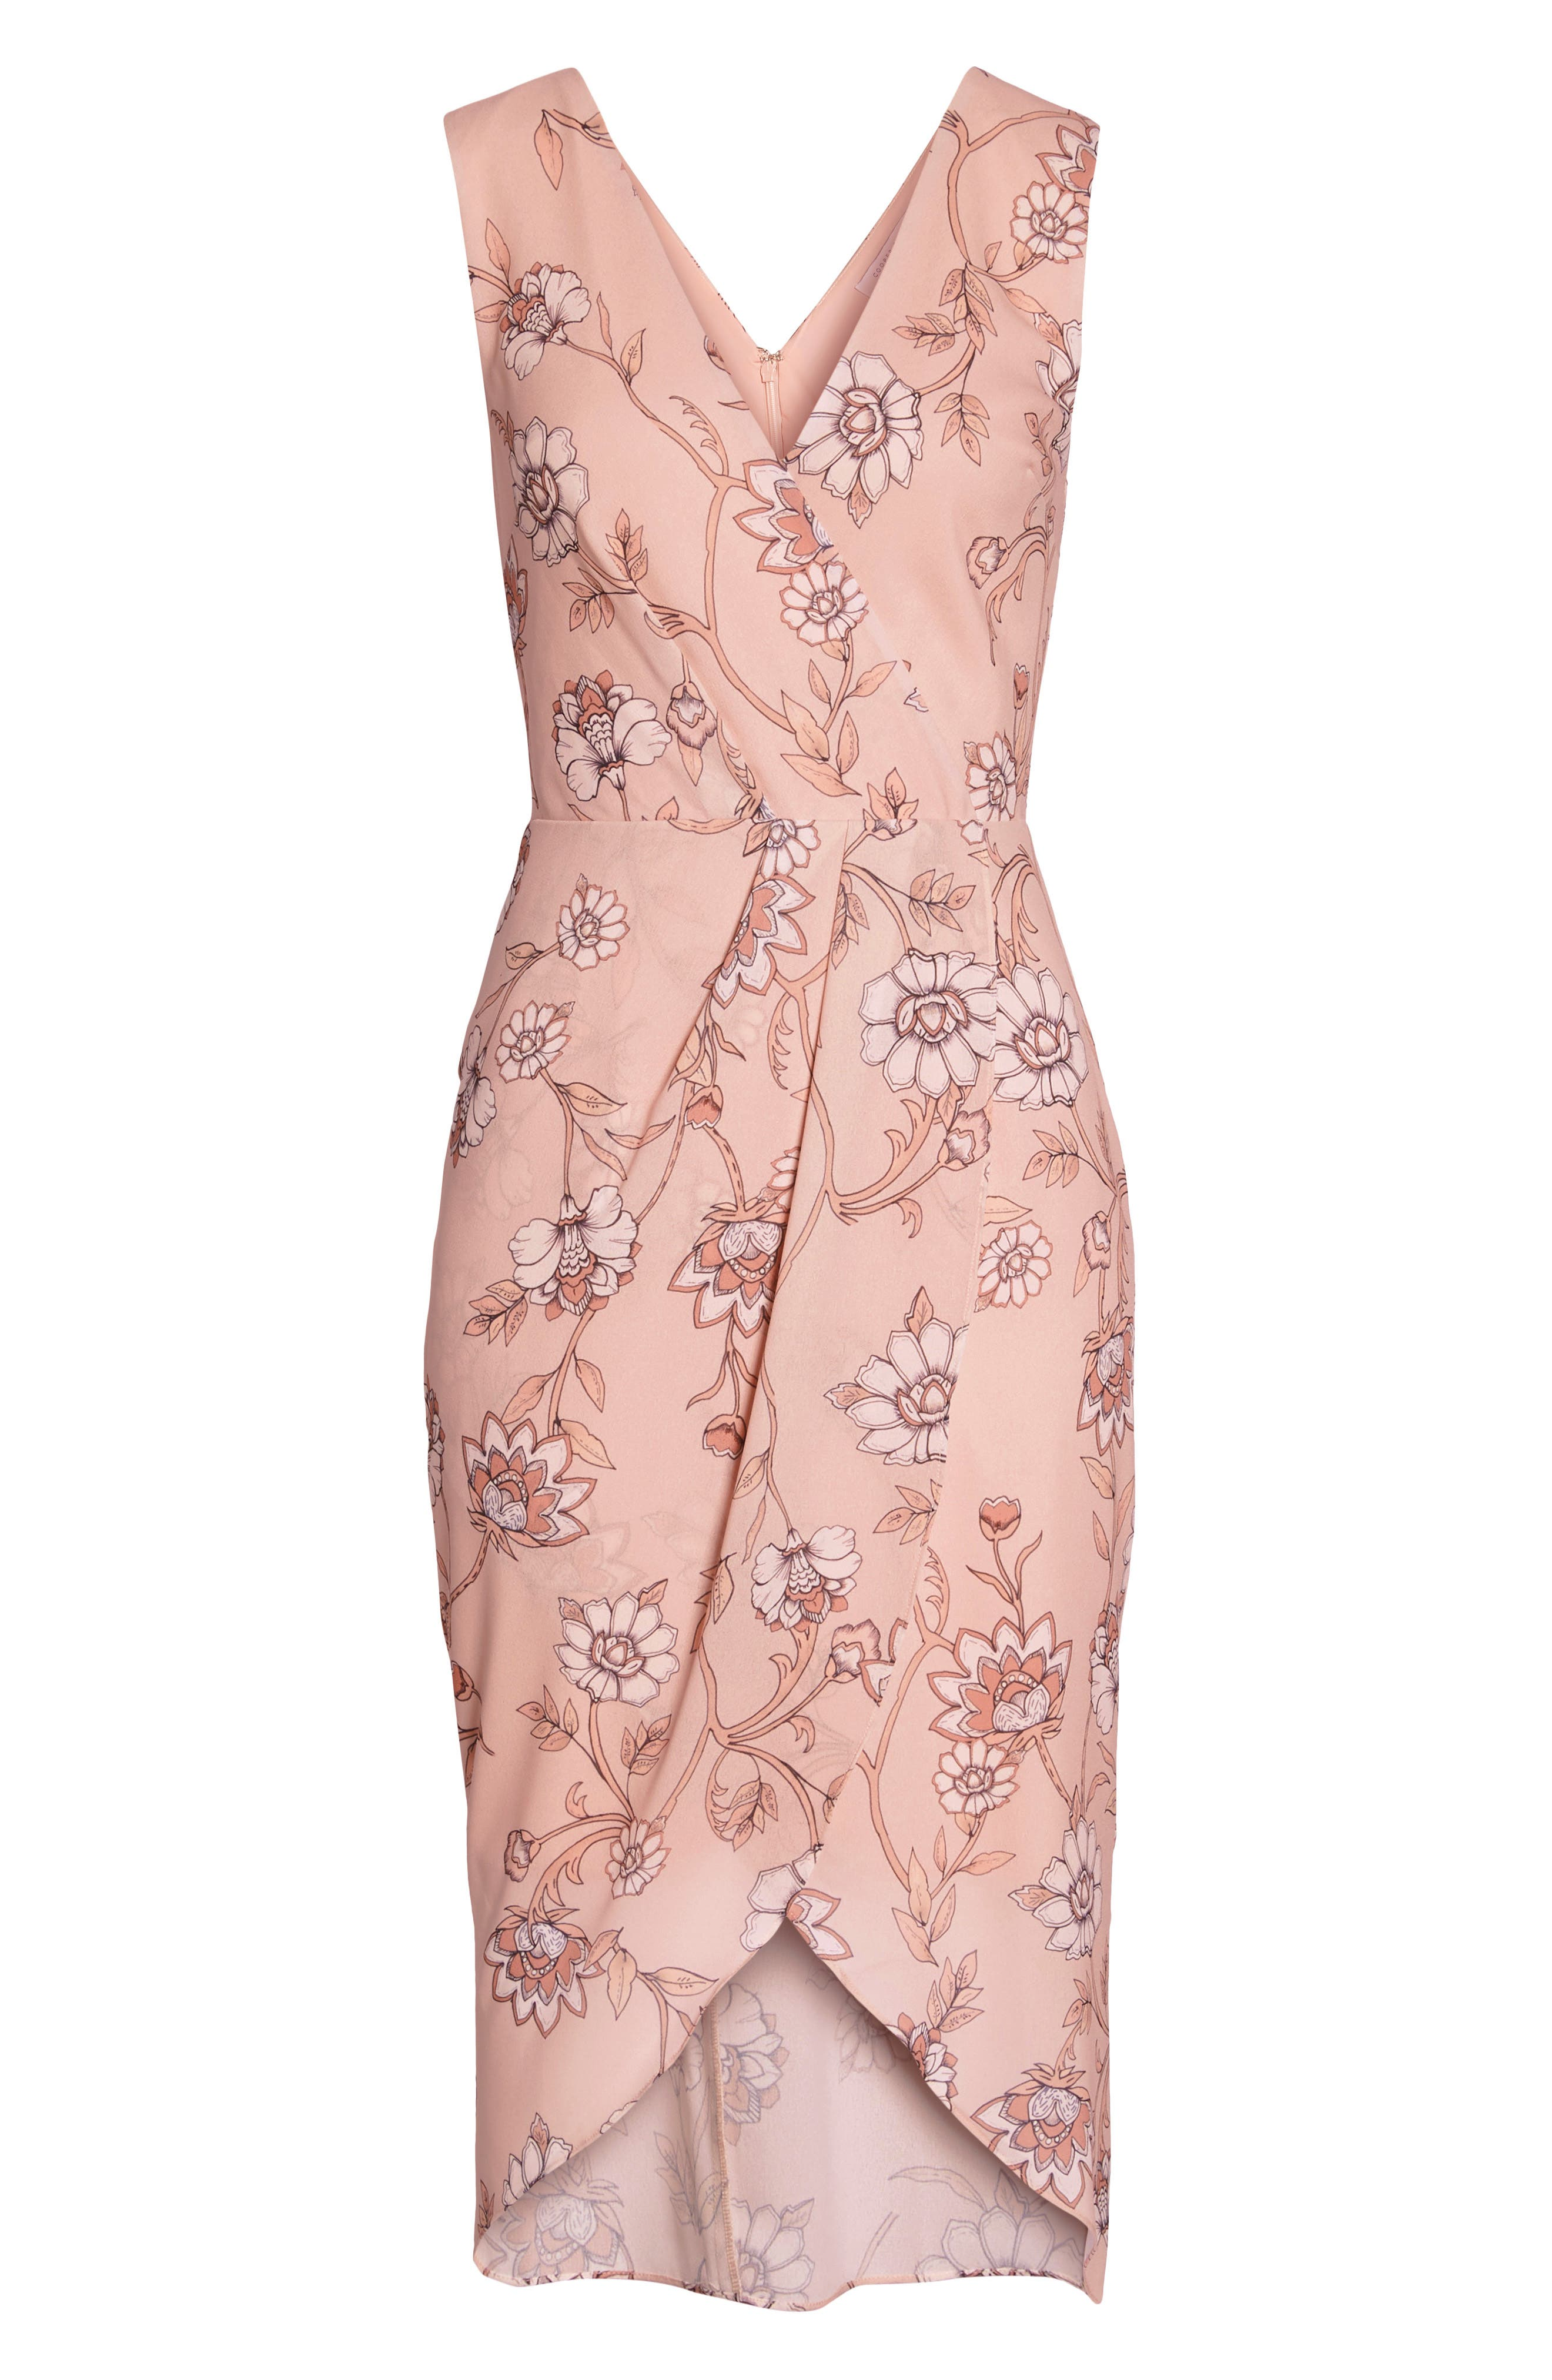 Fiorella Floral Draped Sheath Dress,                             Alternate thumbnail 8, color,                             668